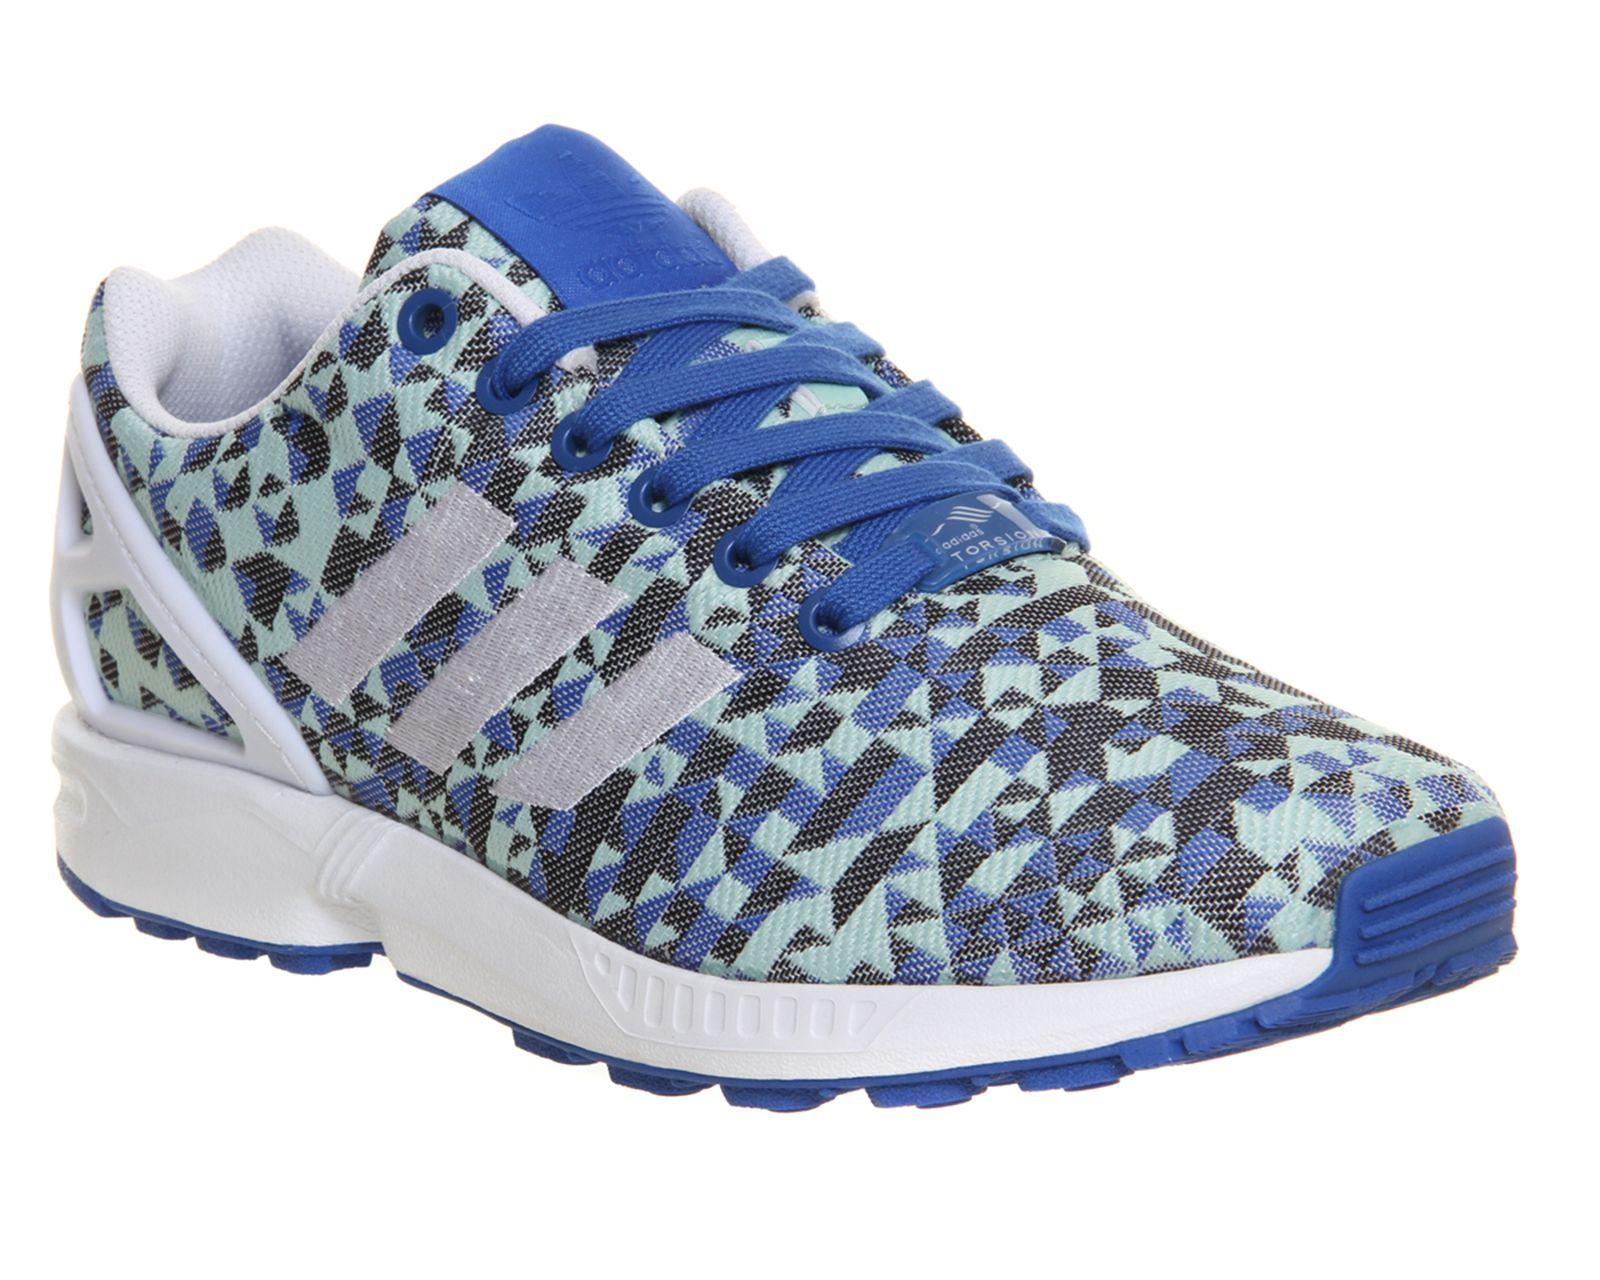 adidas zx flusso tessuto blu - bianco - rosso le scarpe sportive unisex